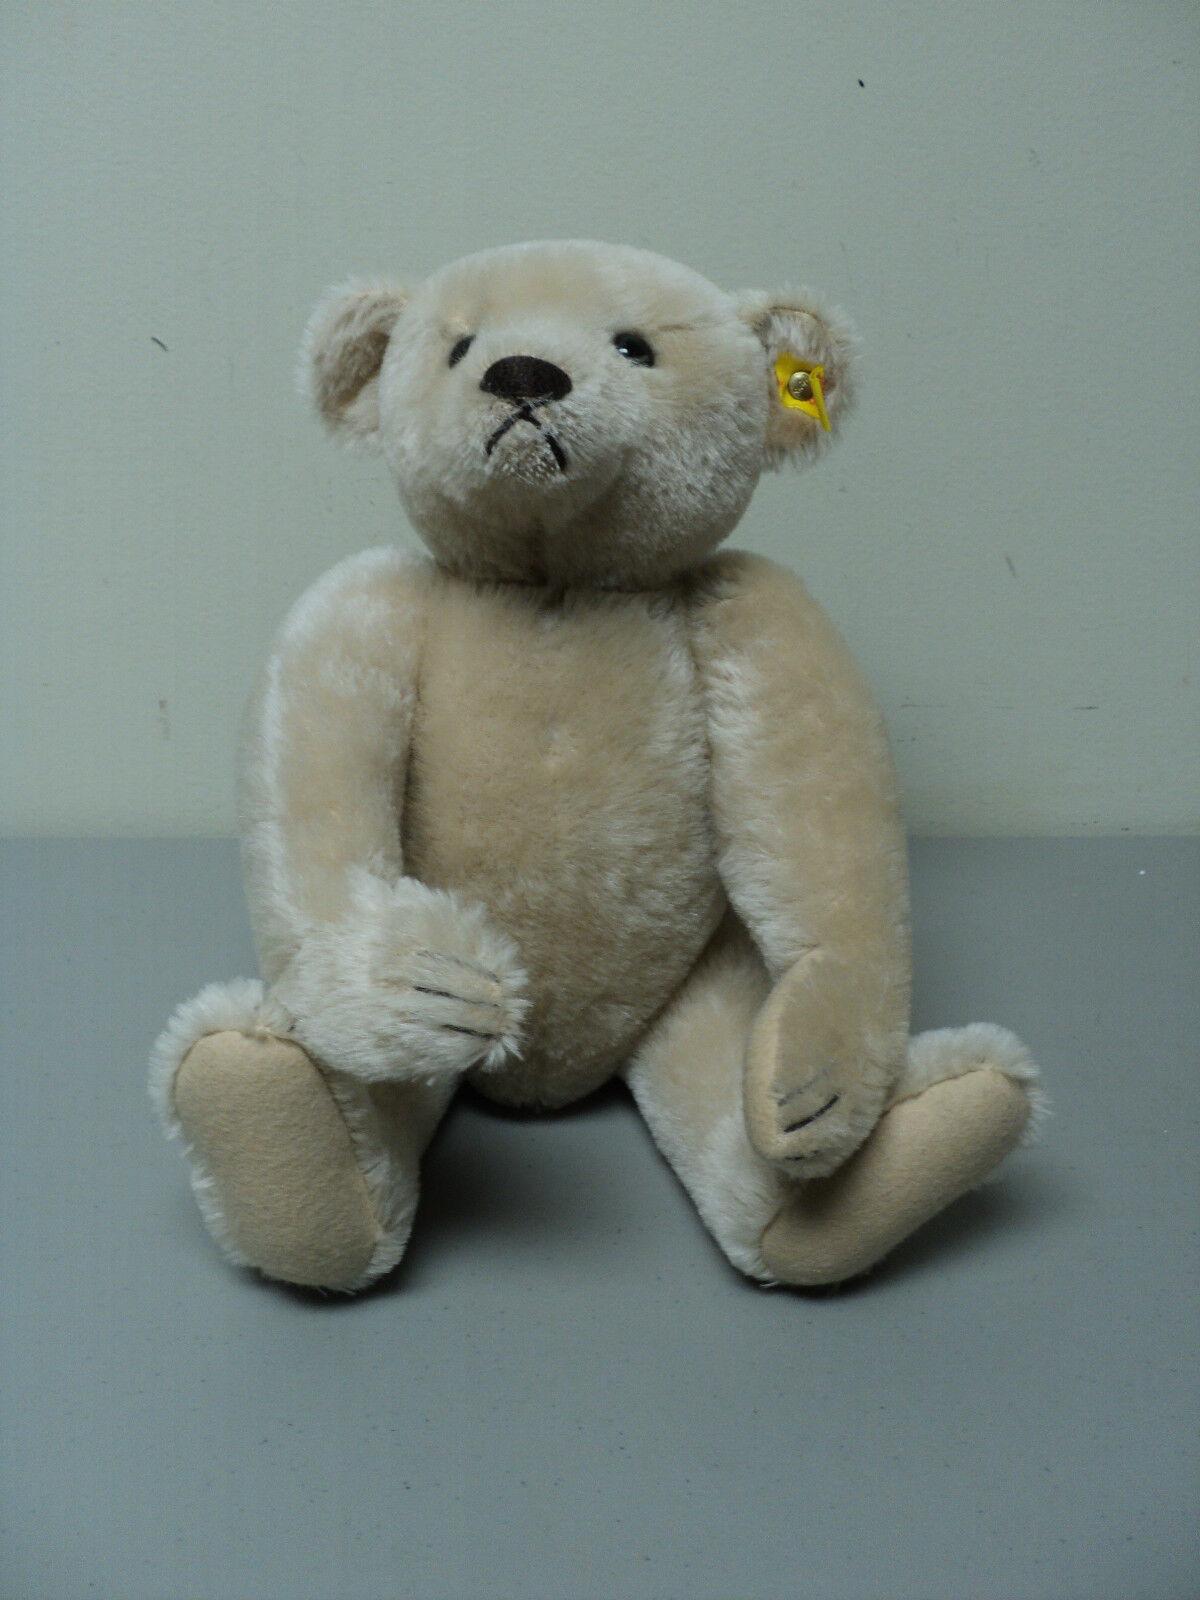 VINTAGE STEIFF  1908 REPLICA  BLONDE MOHAIR TEDDY BEAR  0157 42, c. 1984